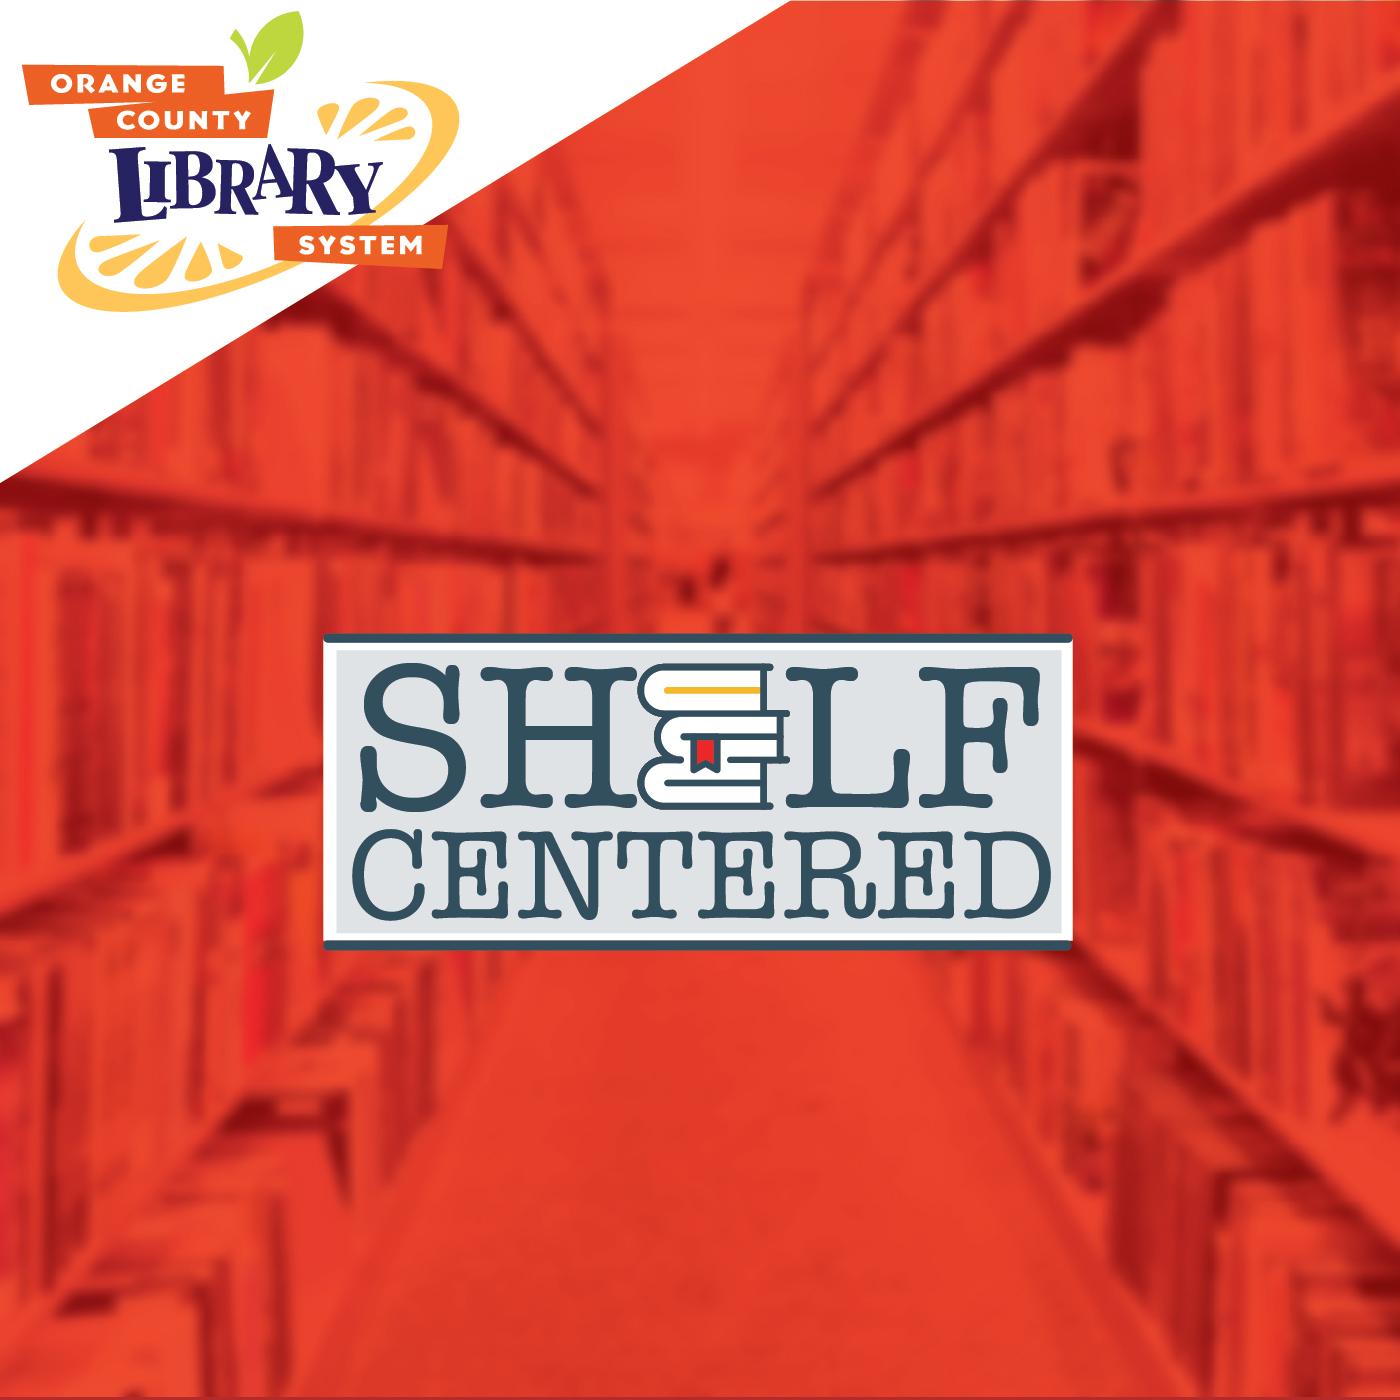 Episode 020 - Meet the Library's Social Worker show art